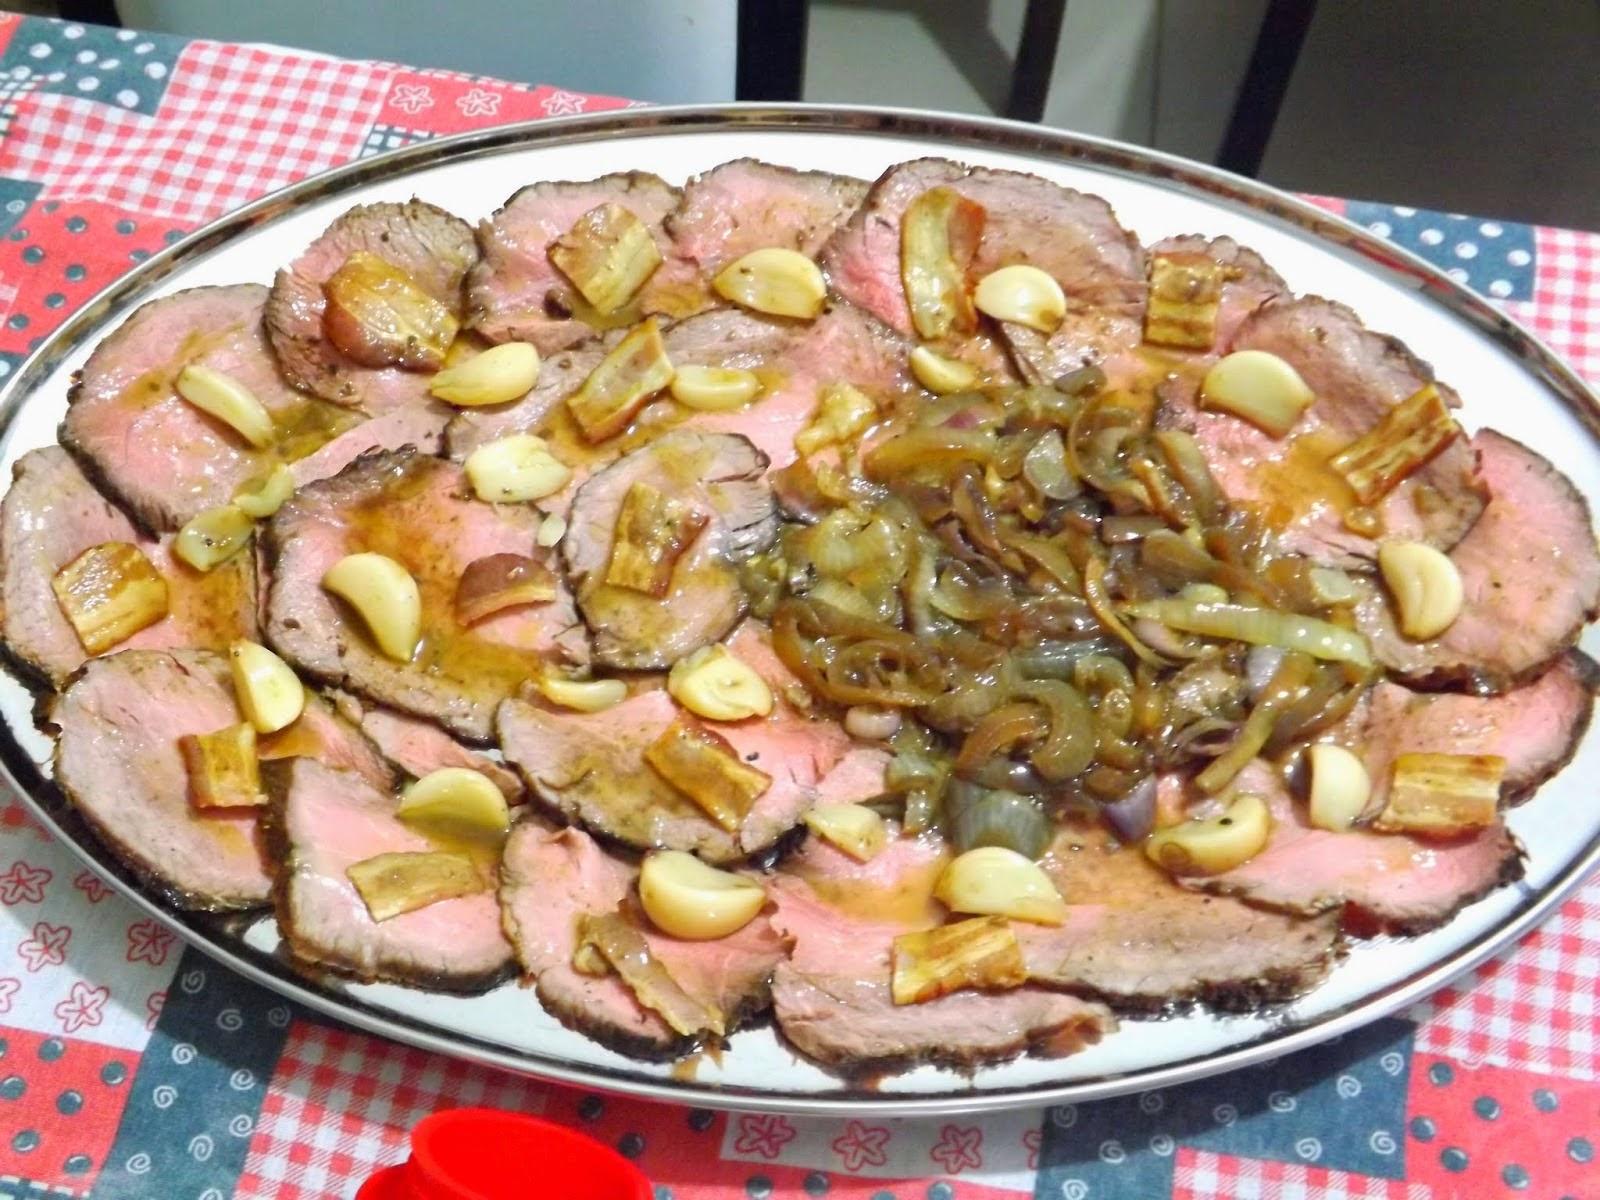 ROAST BEEF DE LAGARTO